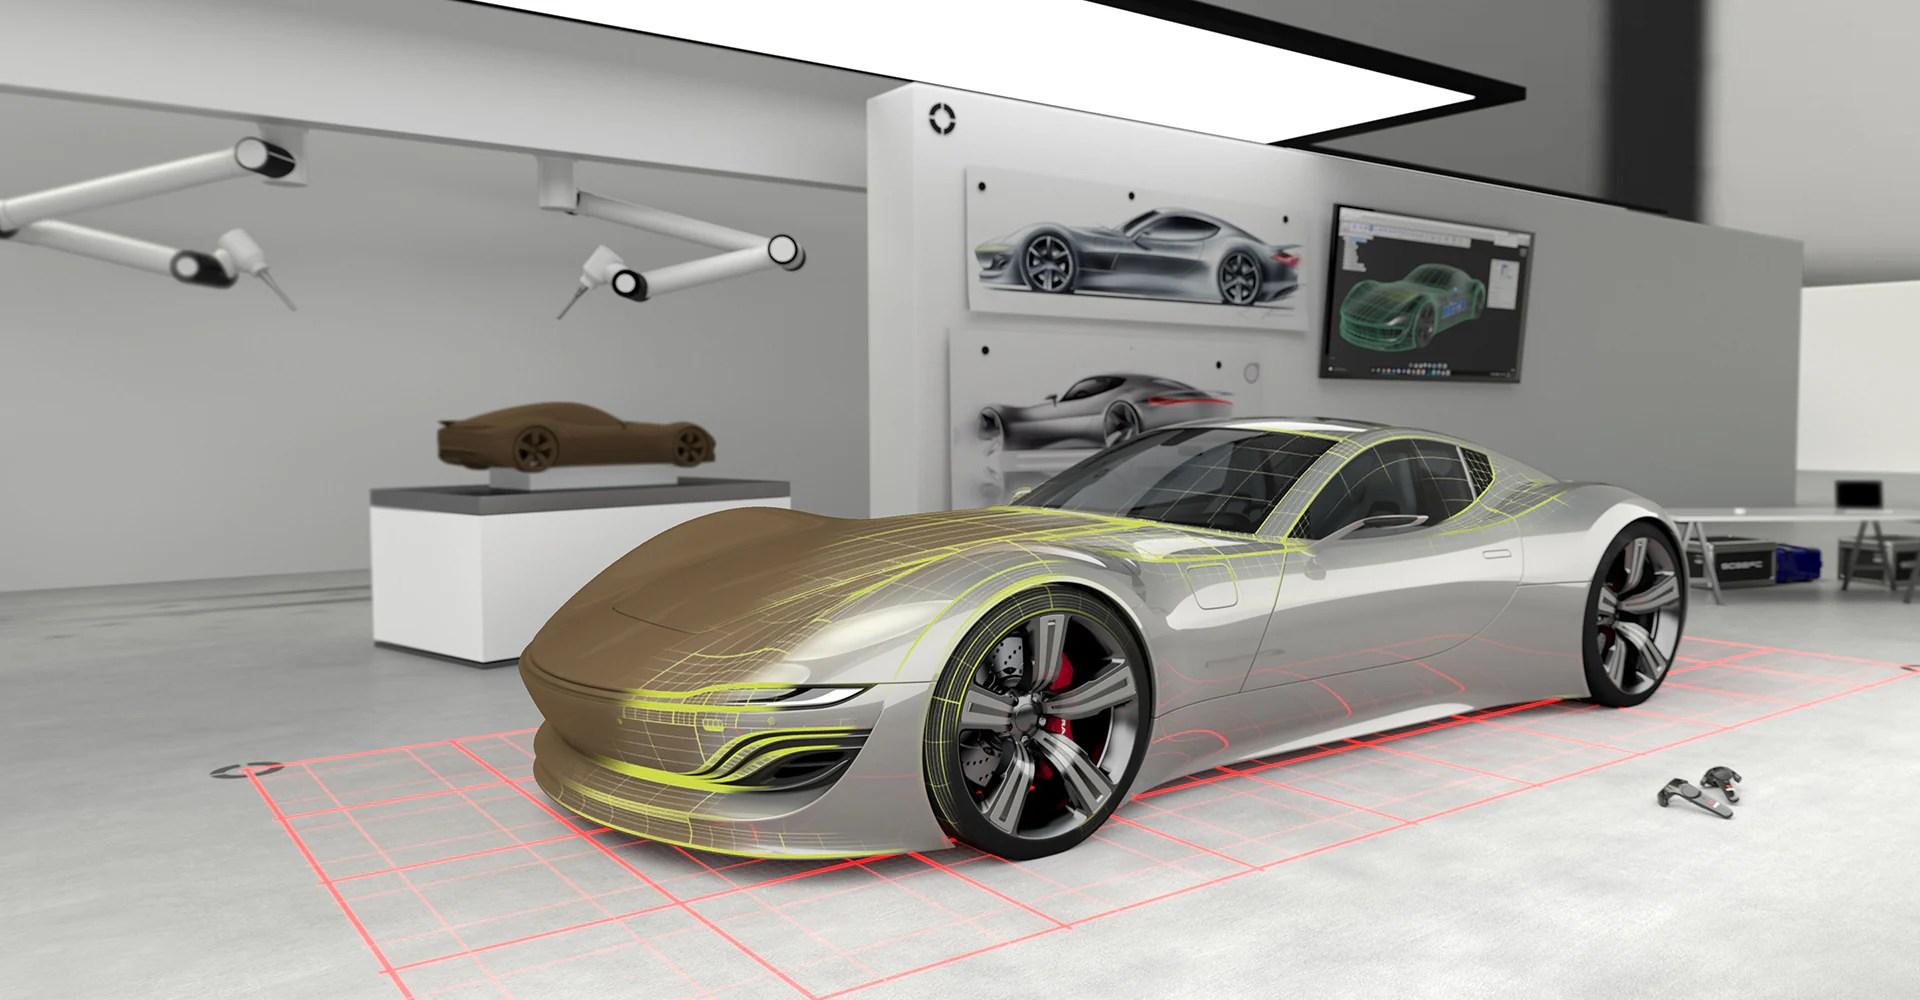 hight resolution of a glimpse into the car design studio of the future